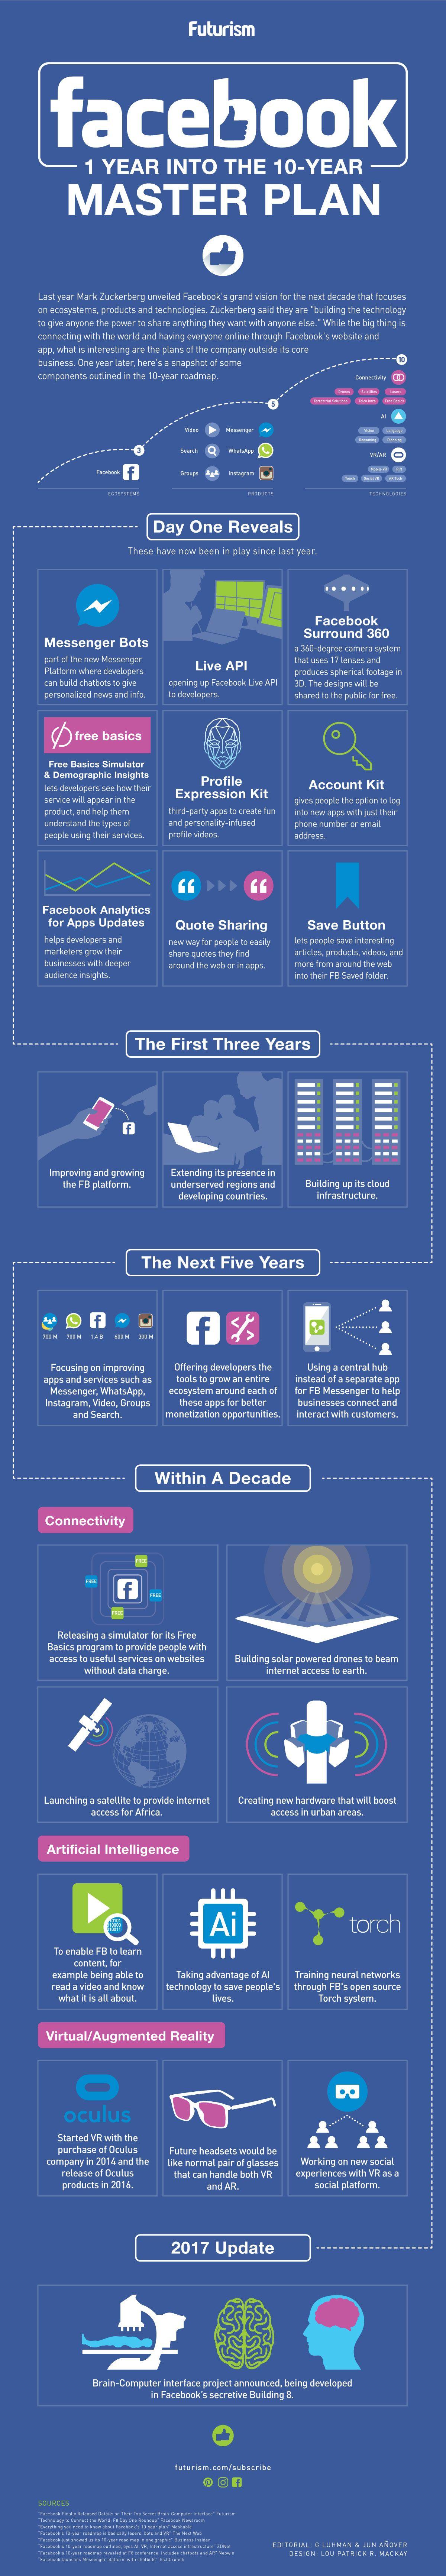 Inside Facebook\'s 10-Year Master Plan [Infographic] | Social Media ...